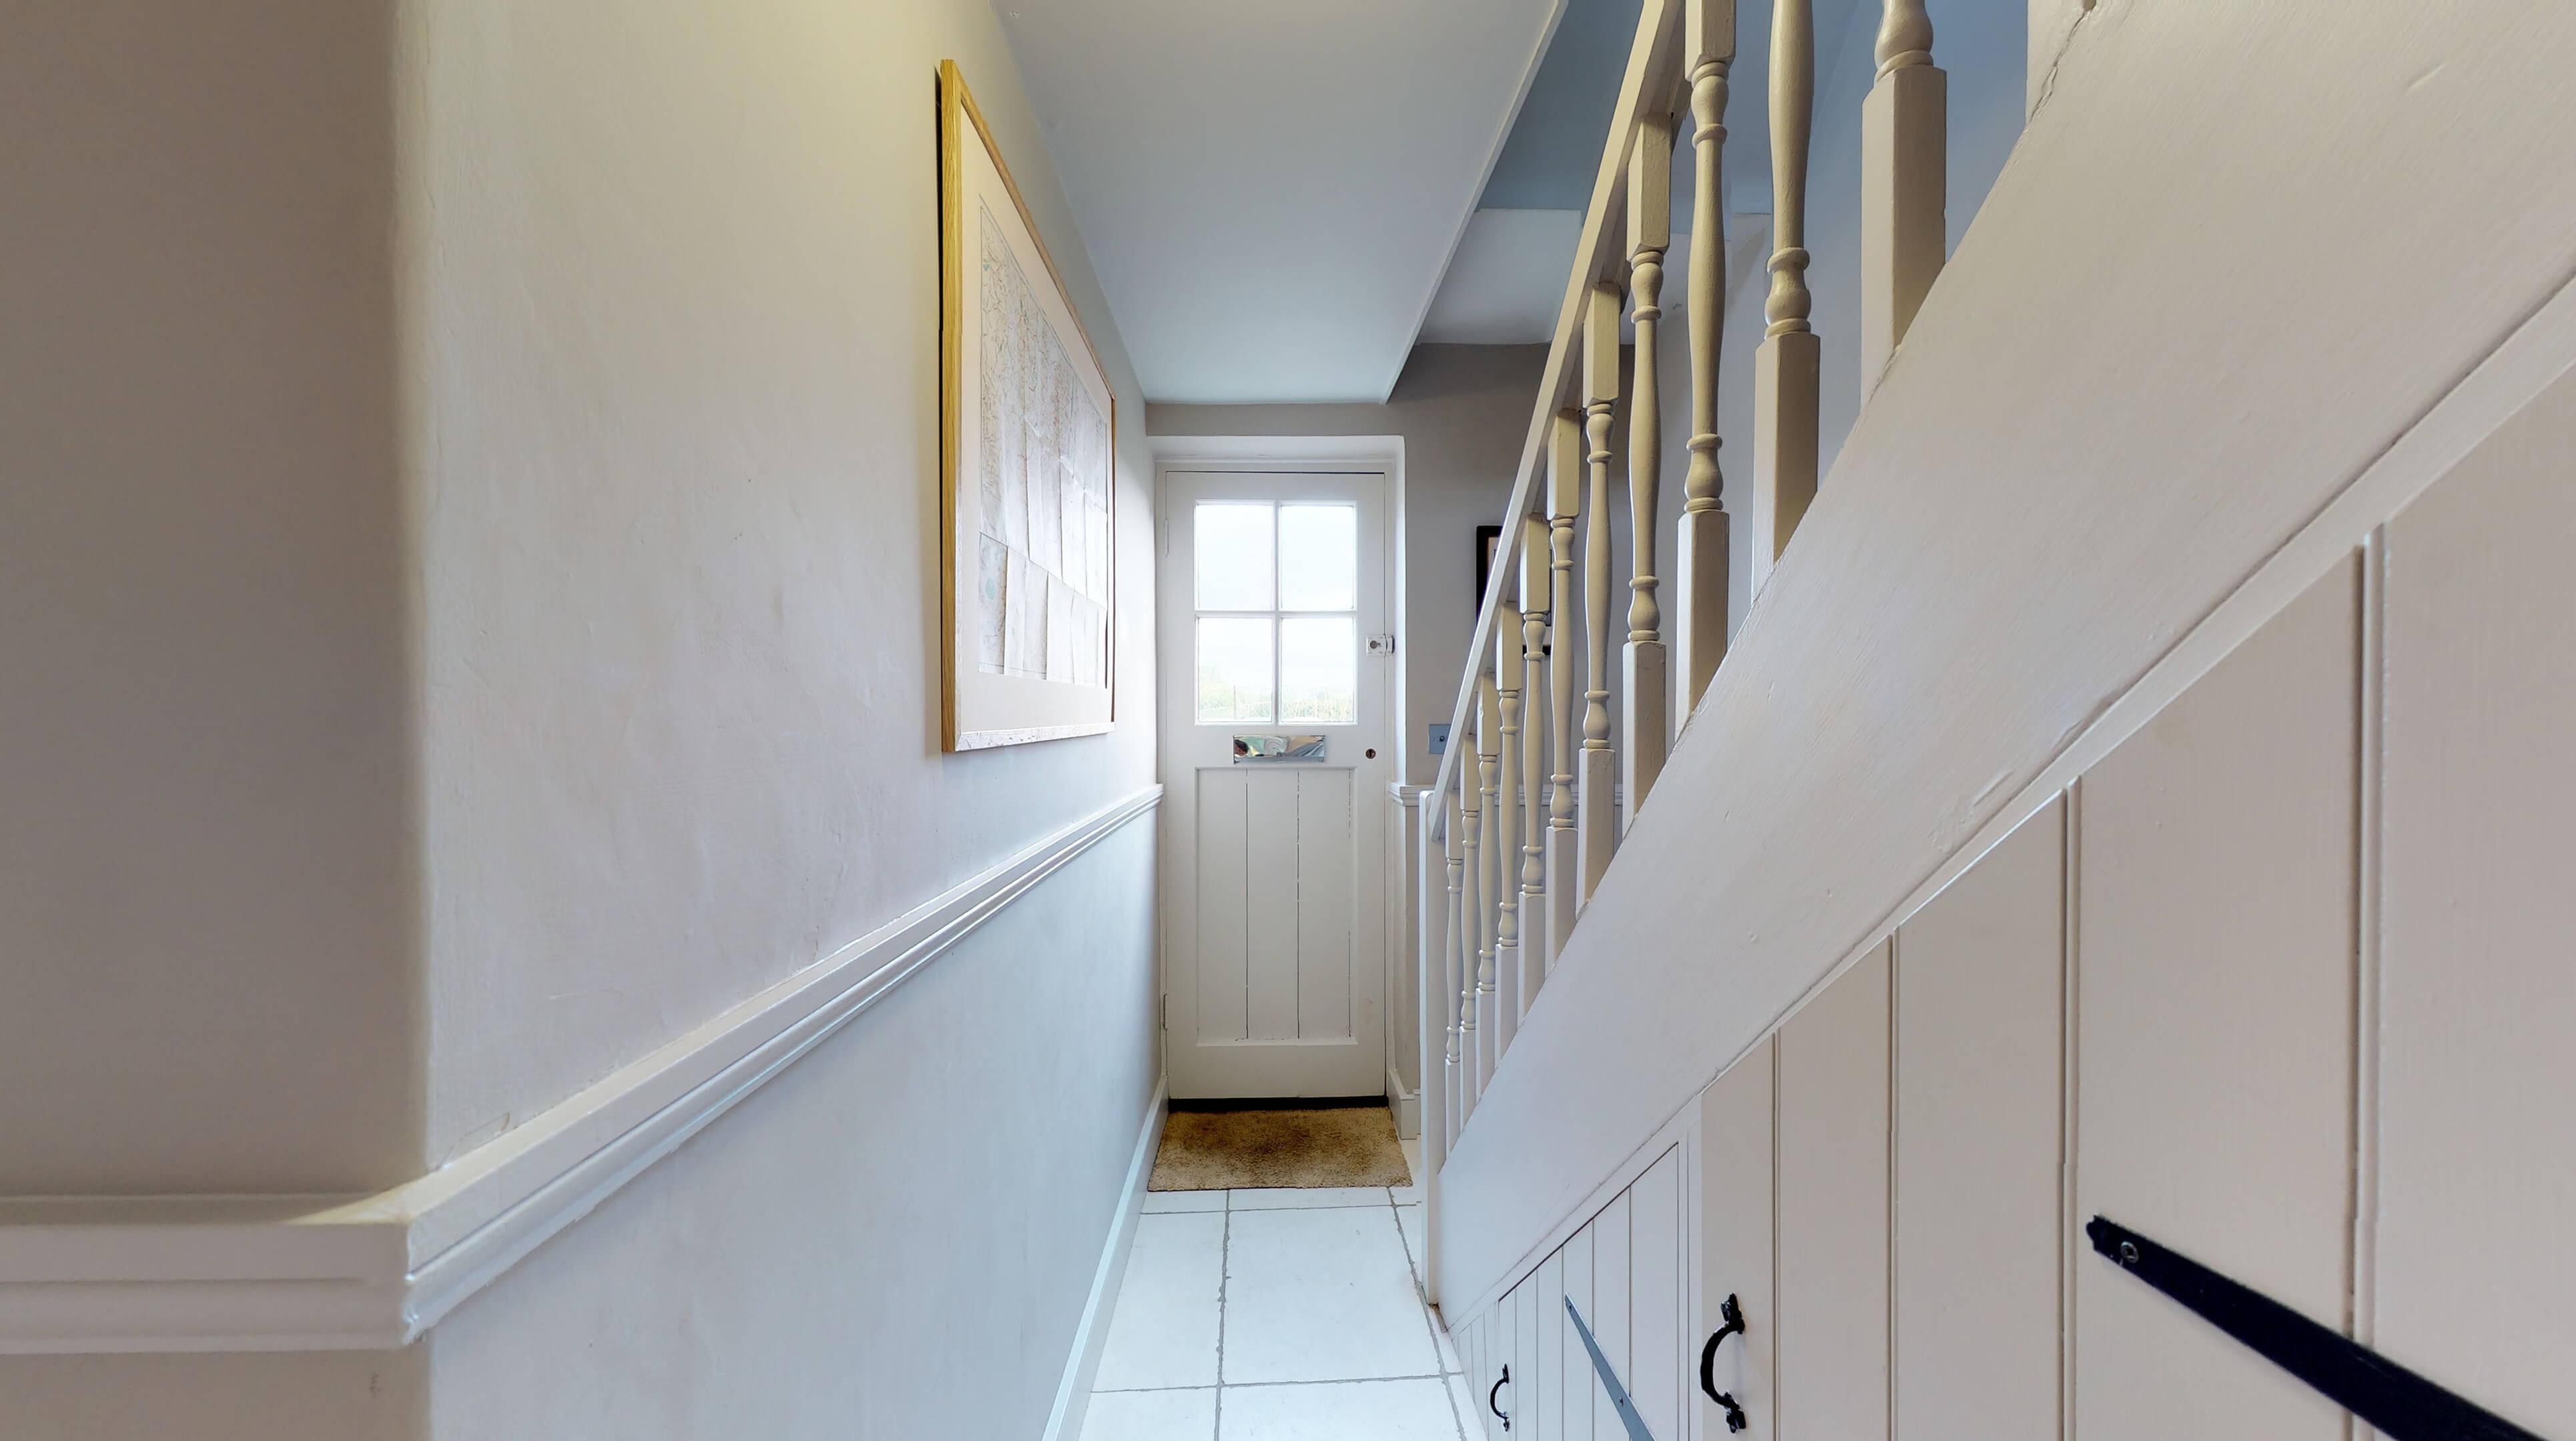 Lower Heyford Three Bedroom Coopers Cottage Hallway